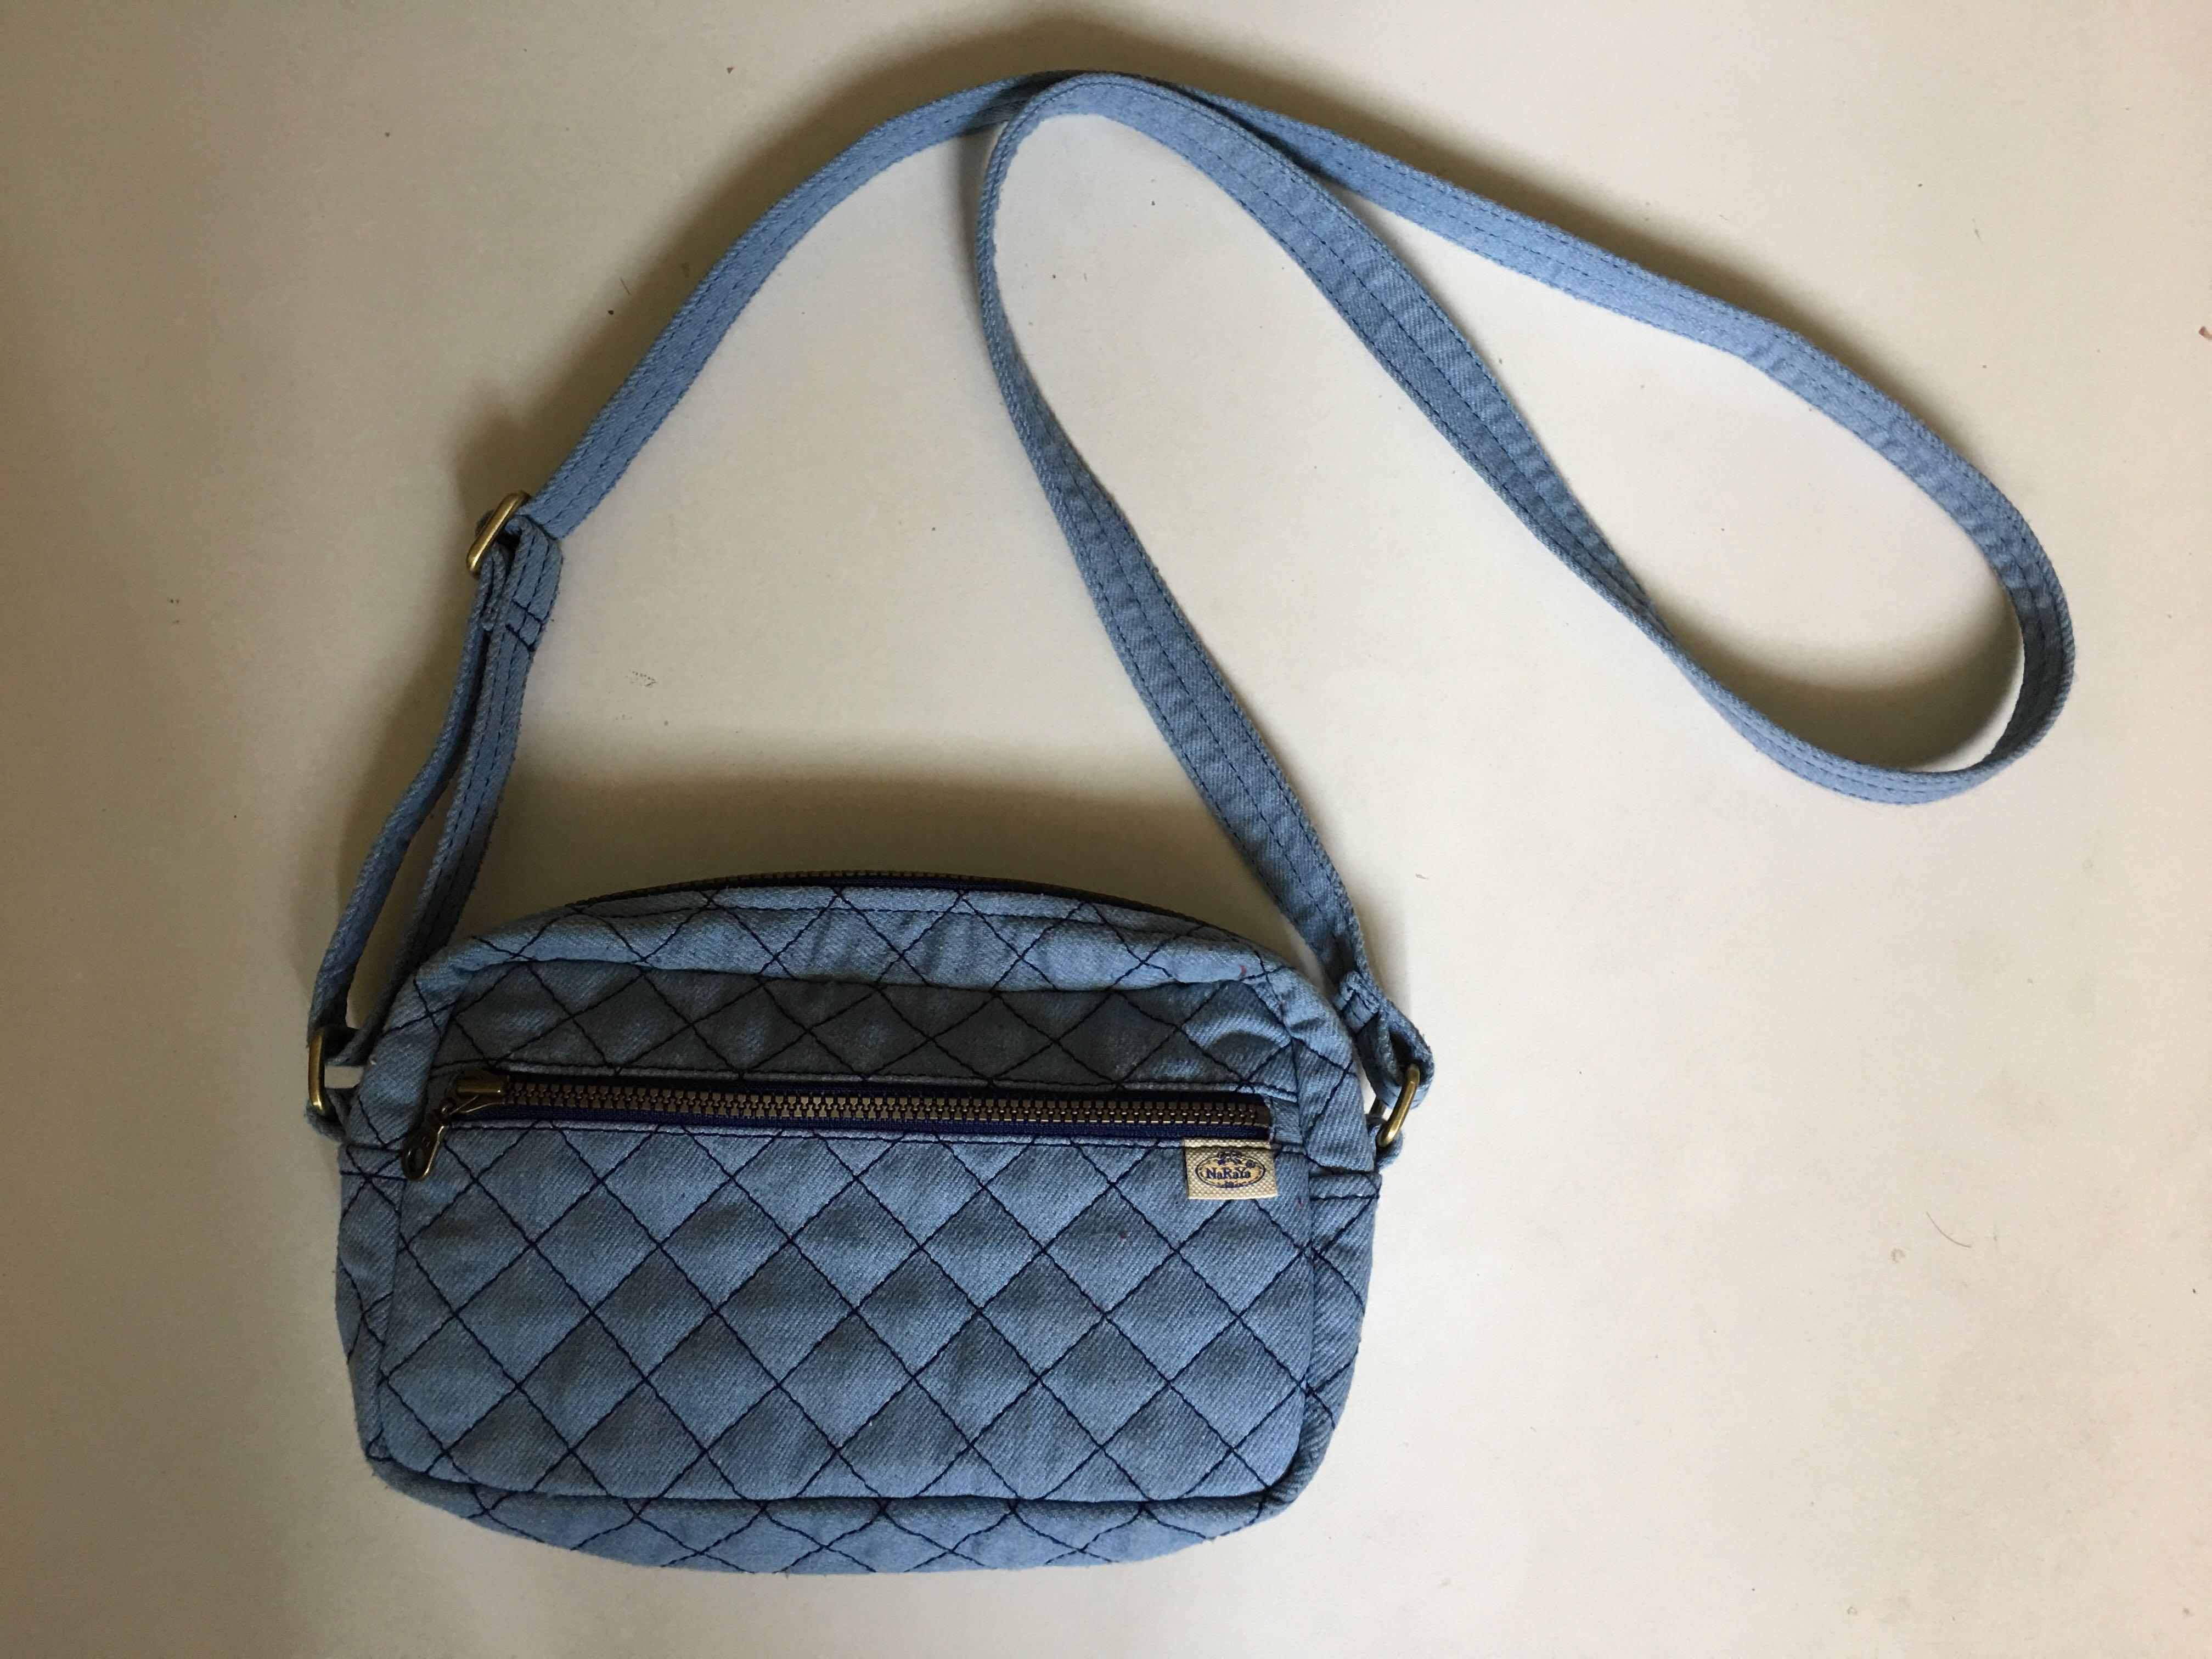 Naraya sling bag denim material a9d3110d4e73c